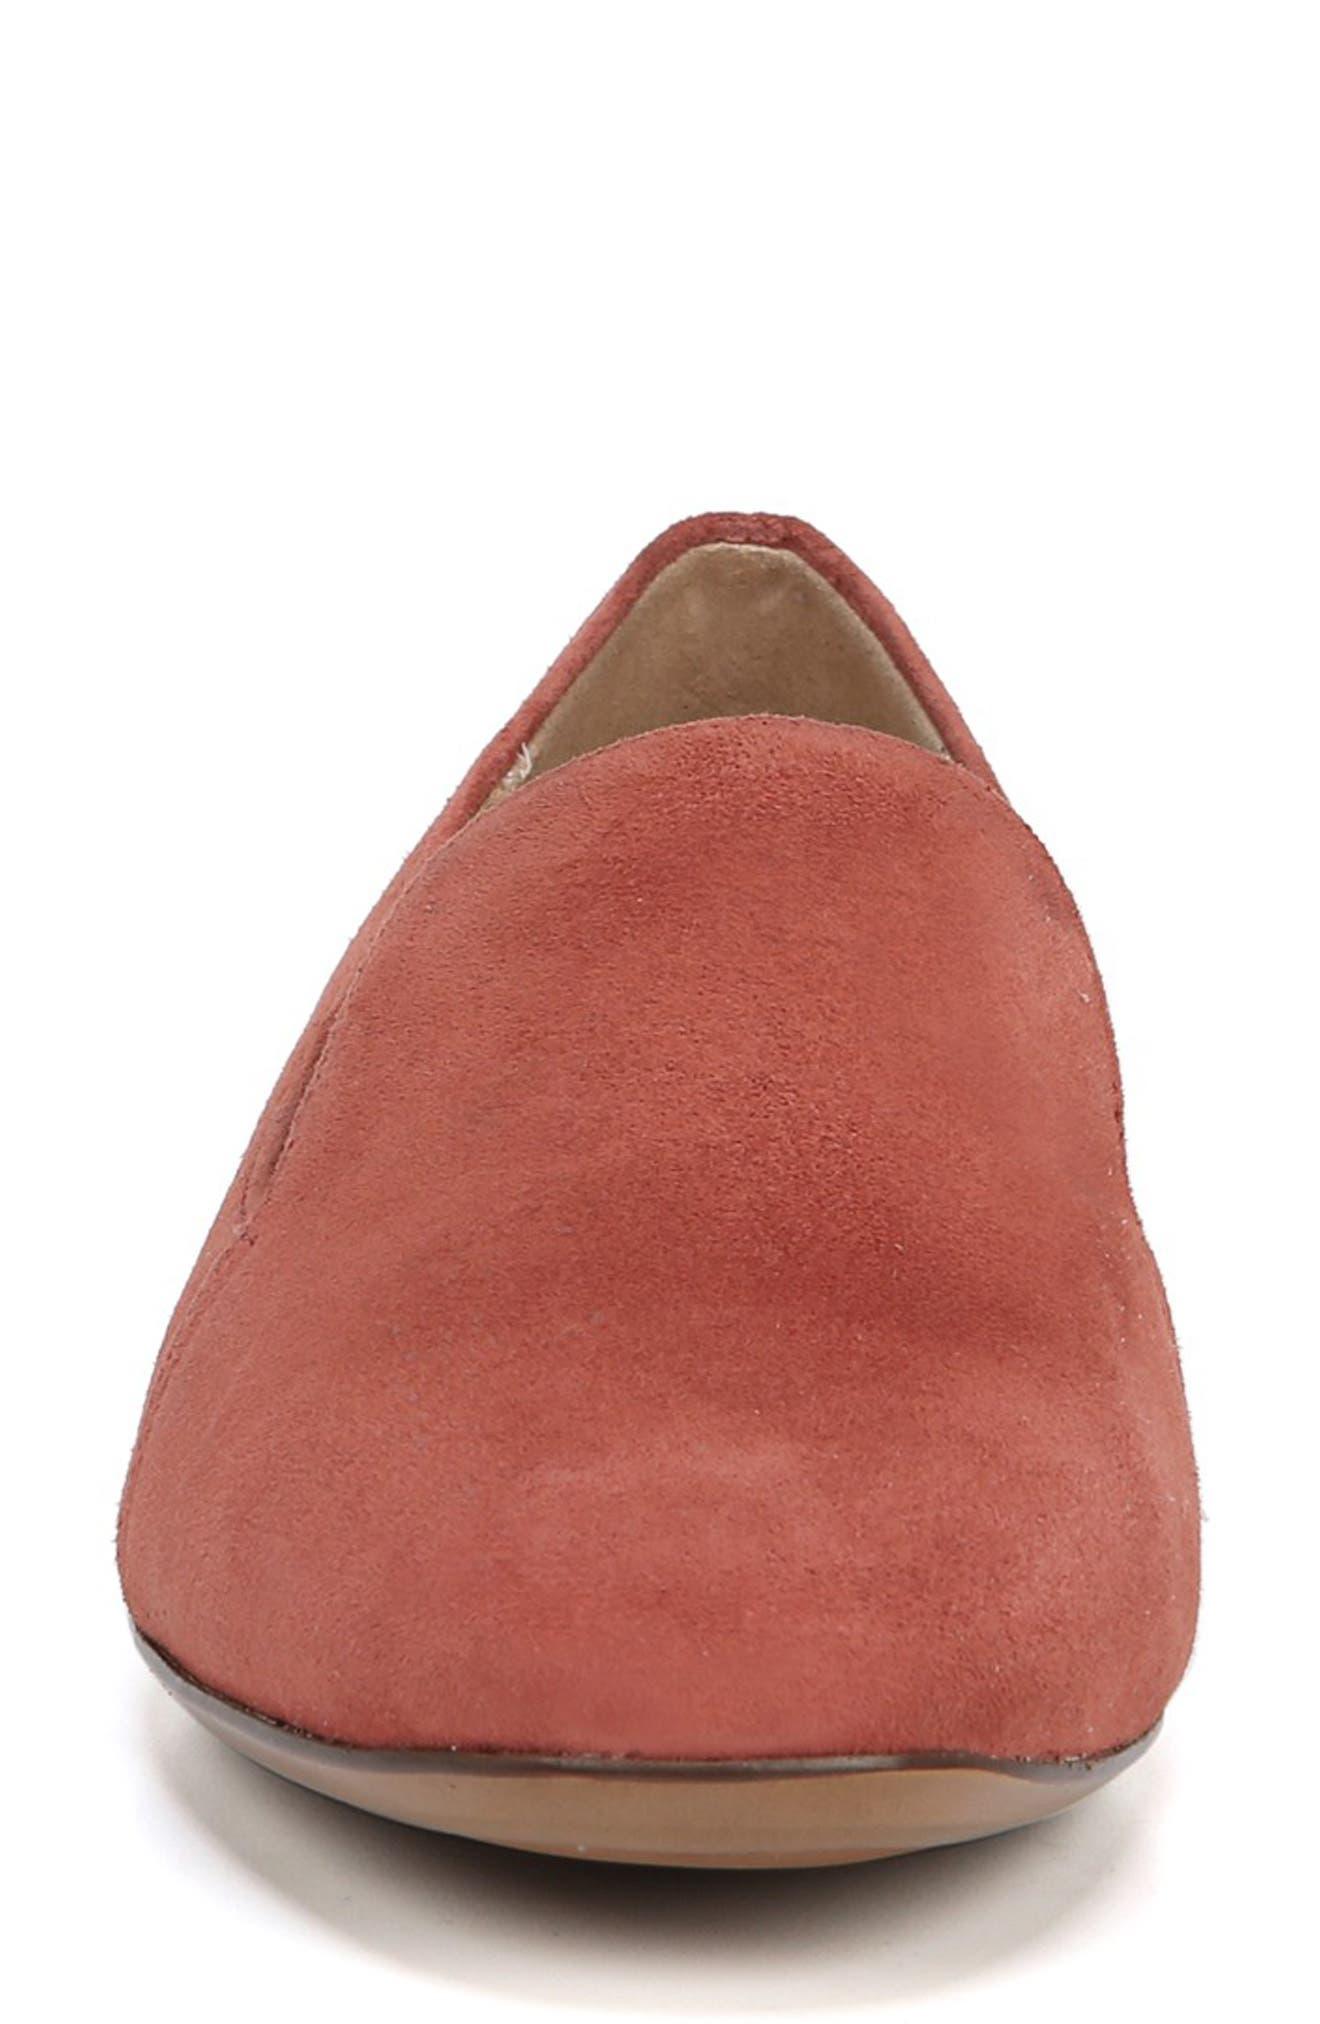 Emiline Flat Loafer,                             Alternate thumbnail 4, color,                             DESERT CLAY SUEDE